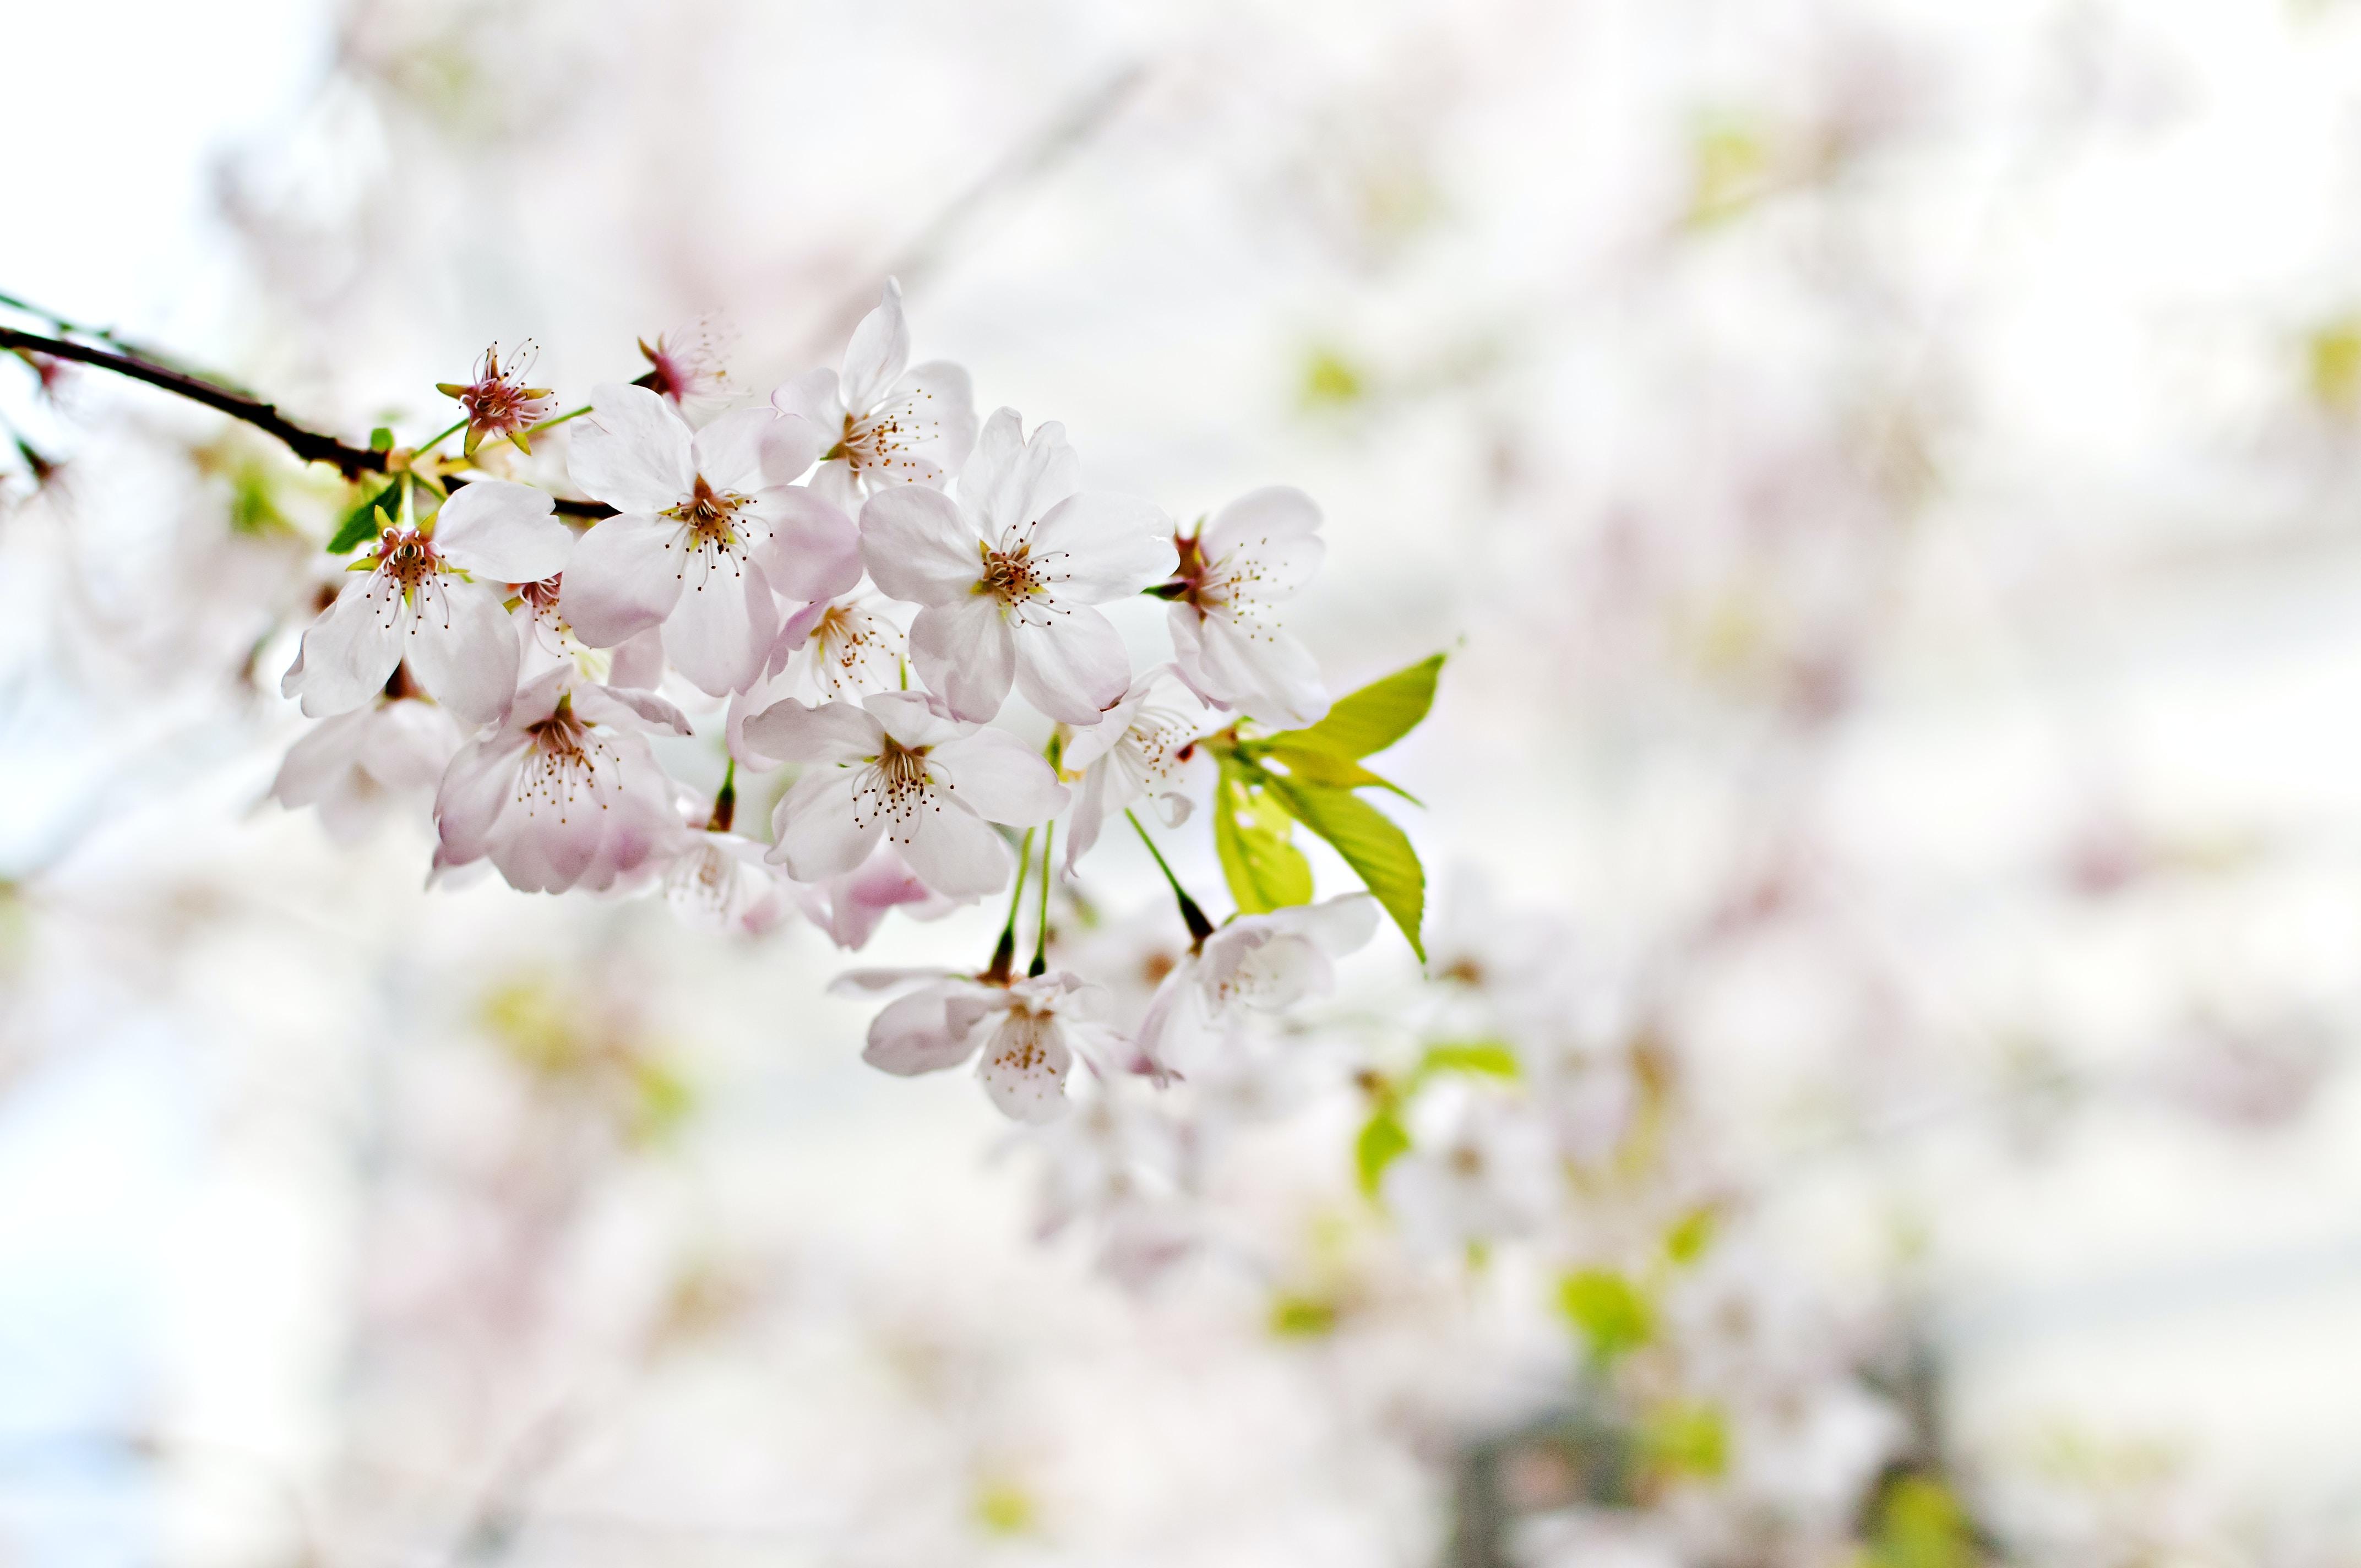 white-and-pink tree flowers macro shot